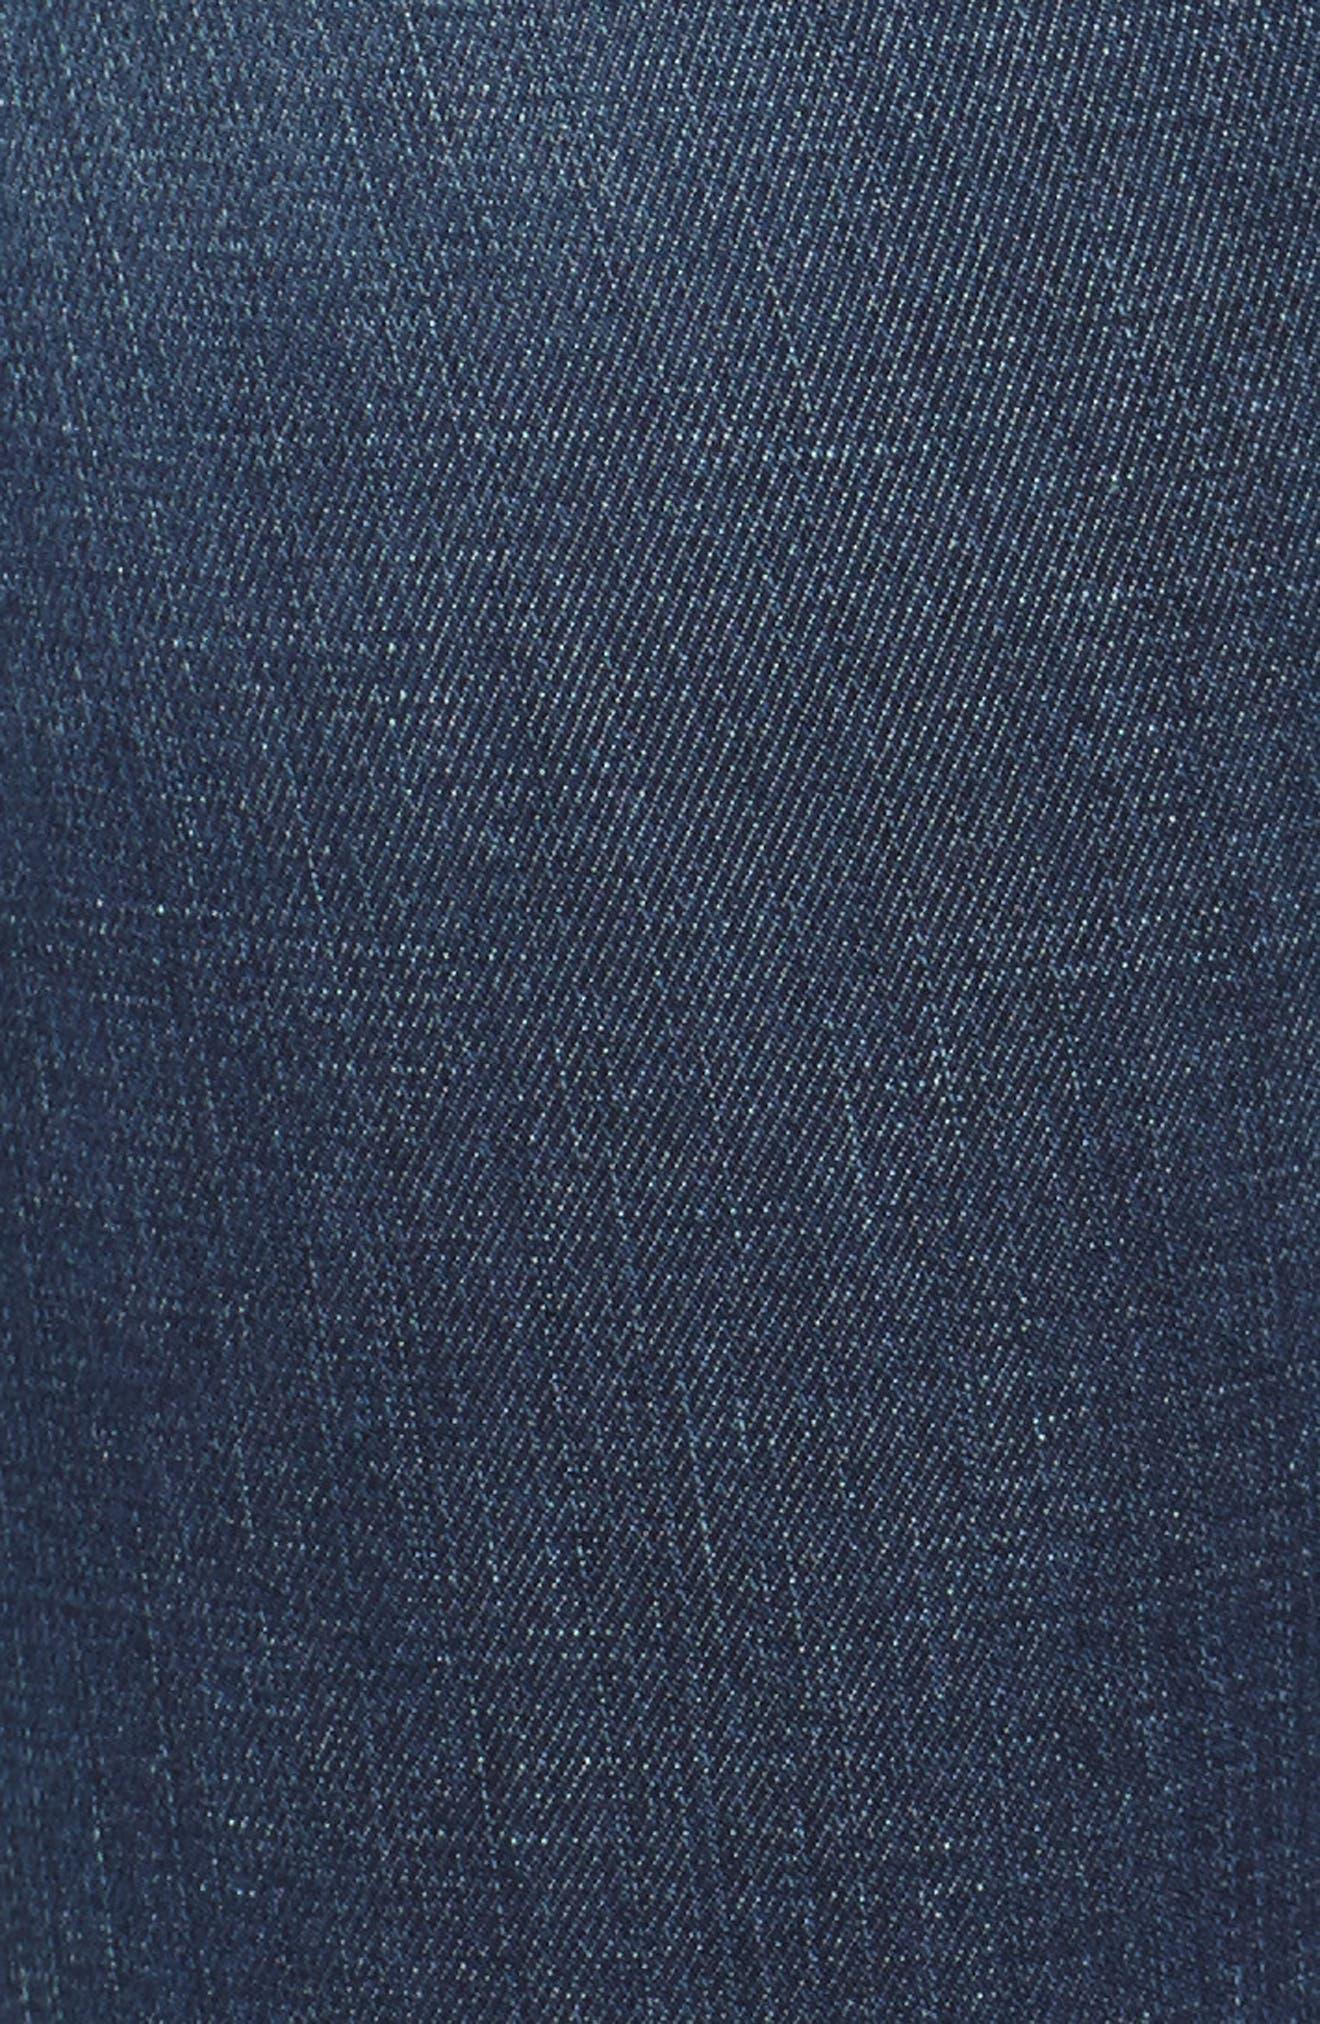 Le Skinny de Jeanne Ripped Raw Hem Ankle Jeans,                             Alternate thumbnail 5, color,                             JOLIE